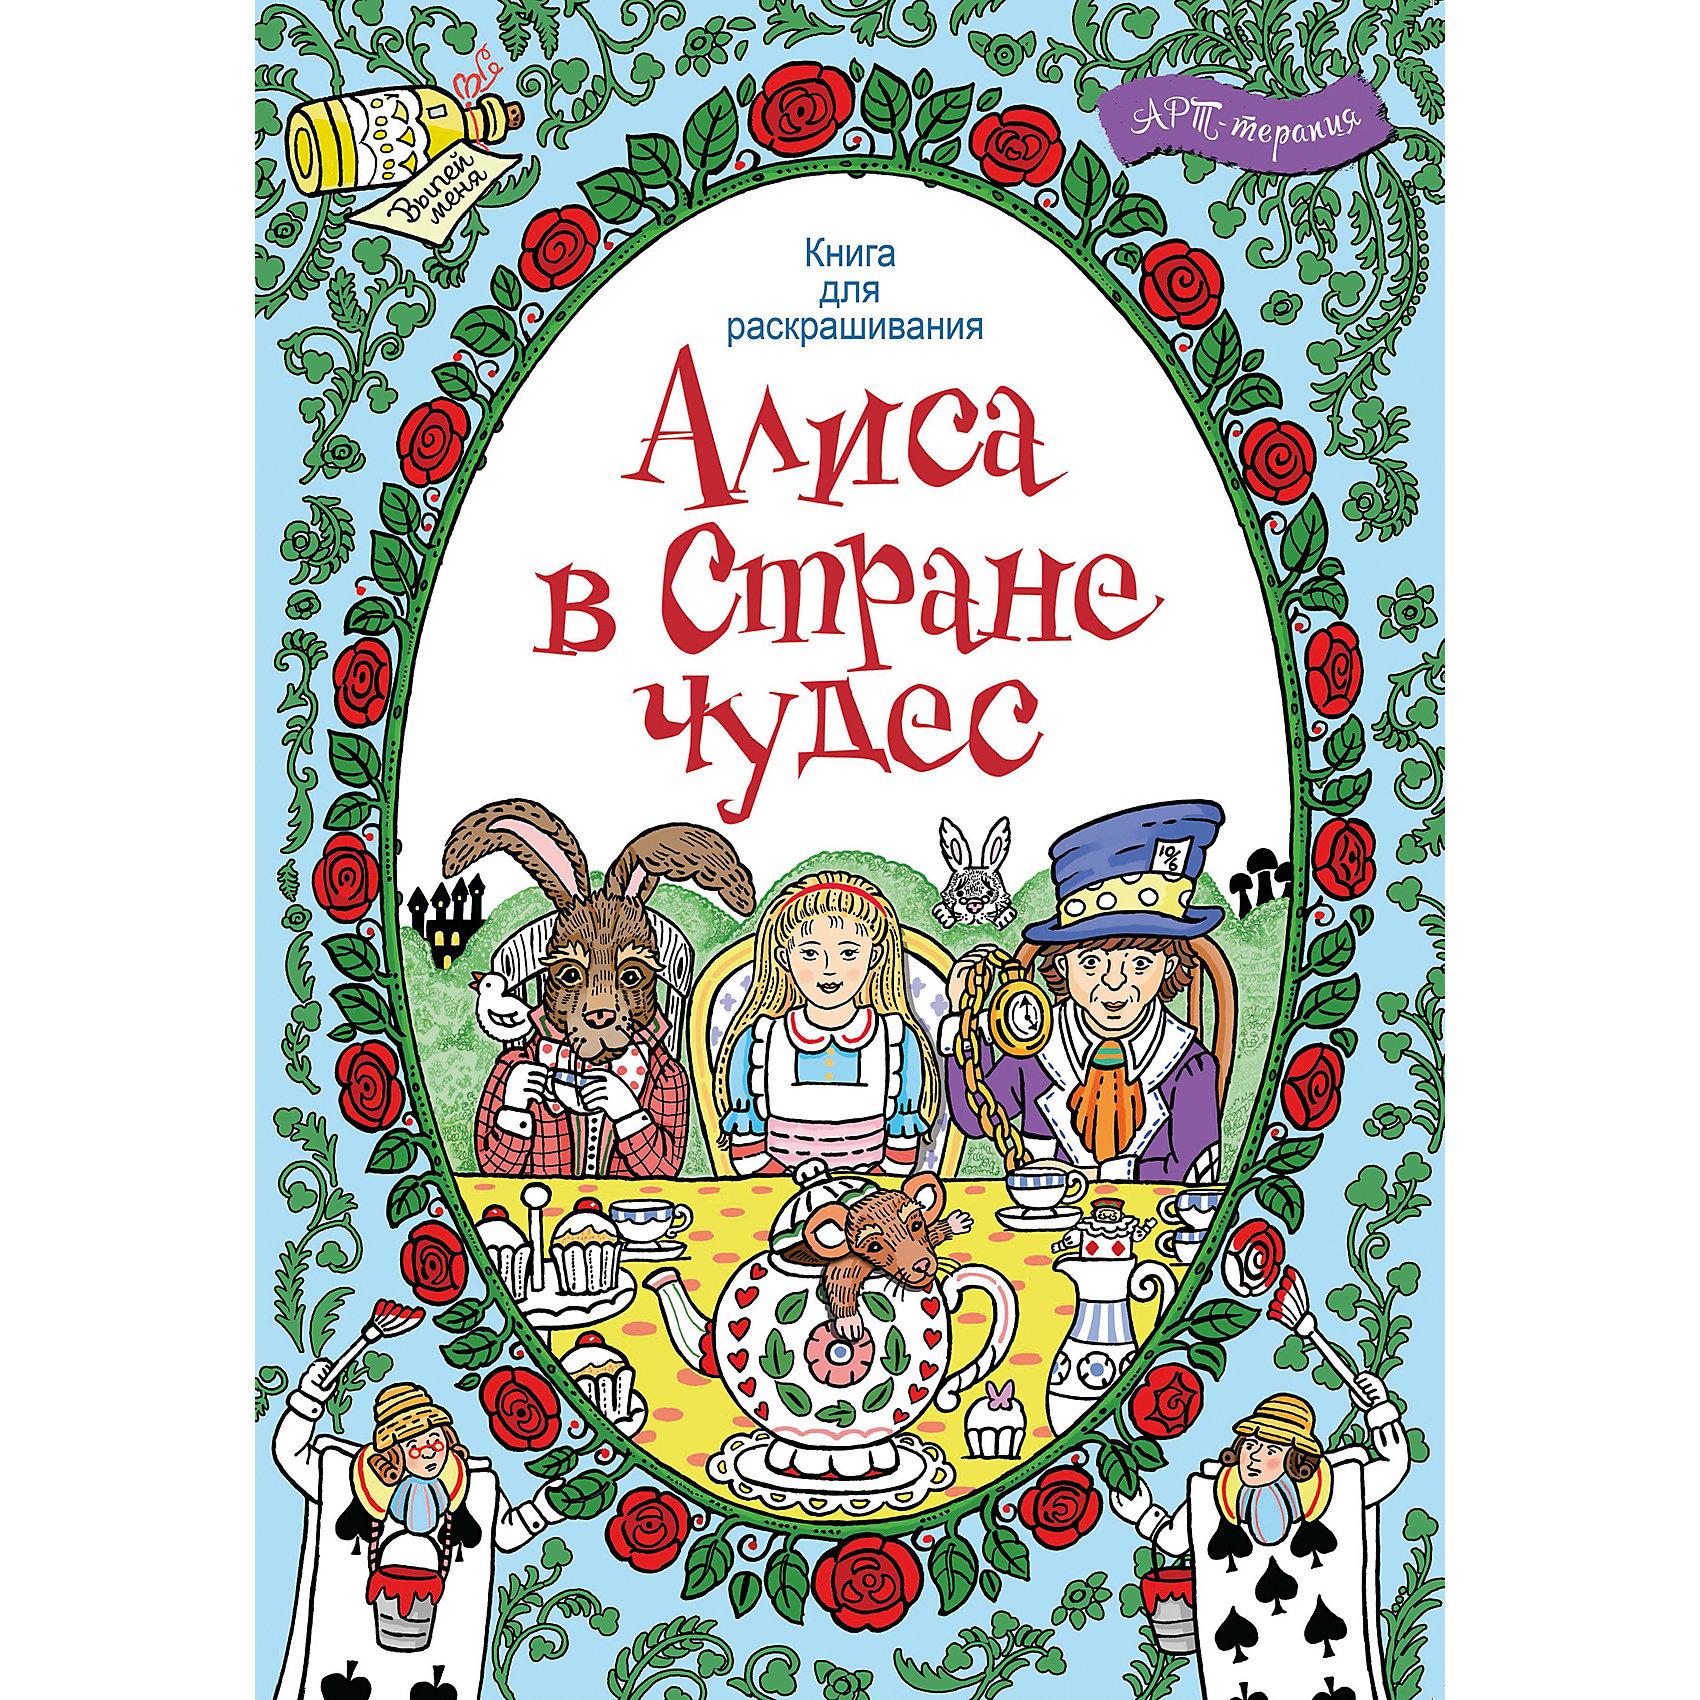 АСТ-ПРЕСС Книга для раскрашивания Алиса в стране чудес книги издательство аст книга базар казан и дастархан